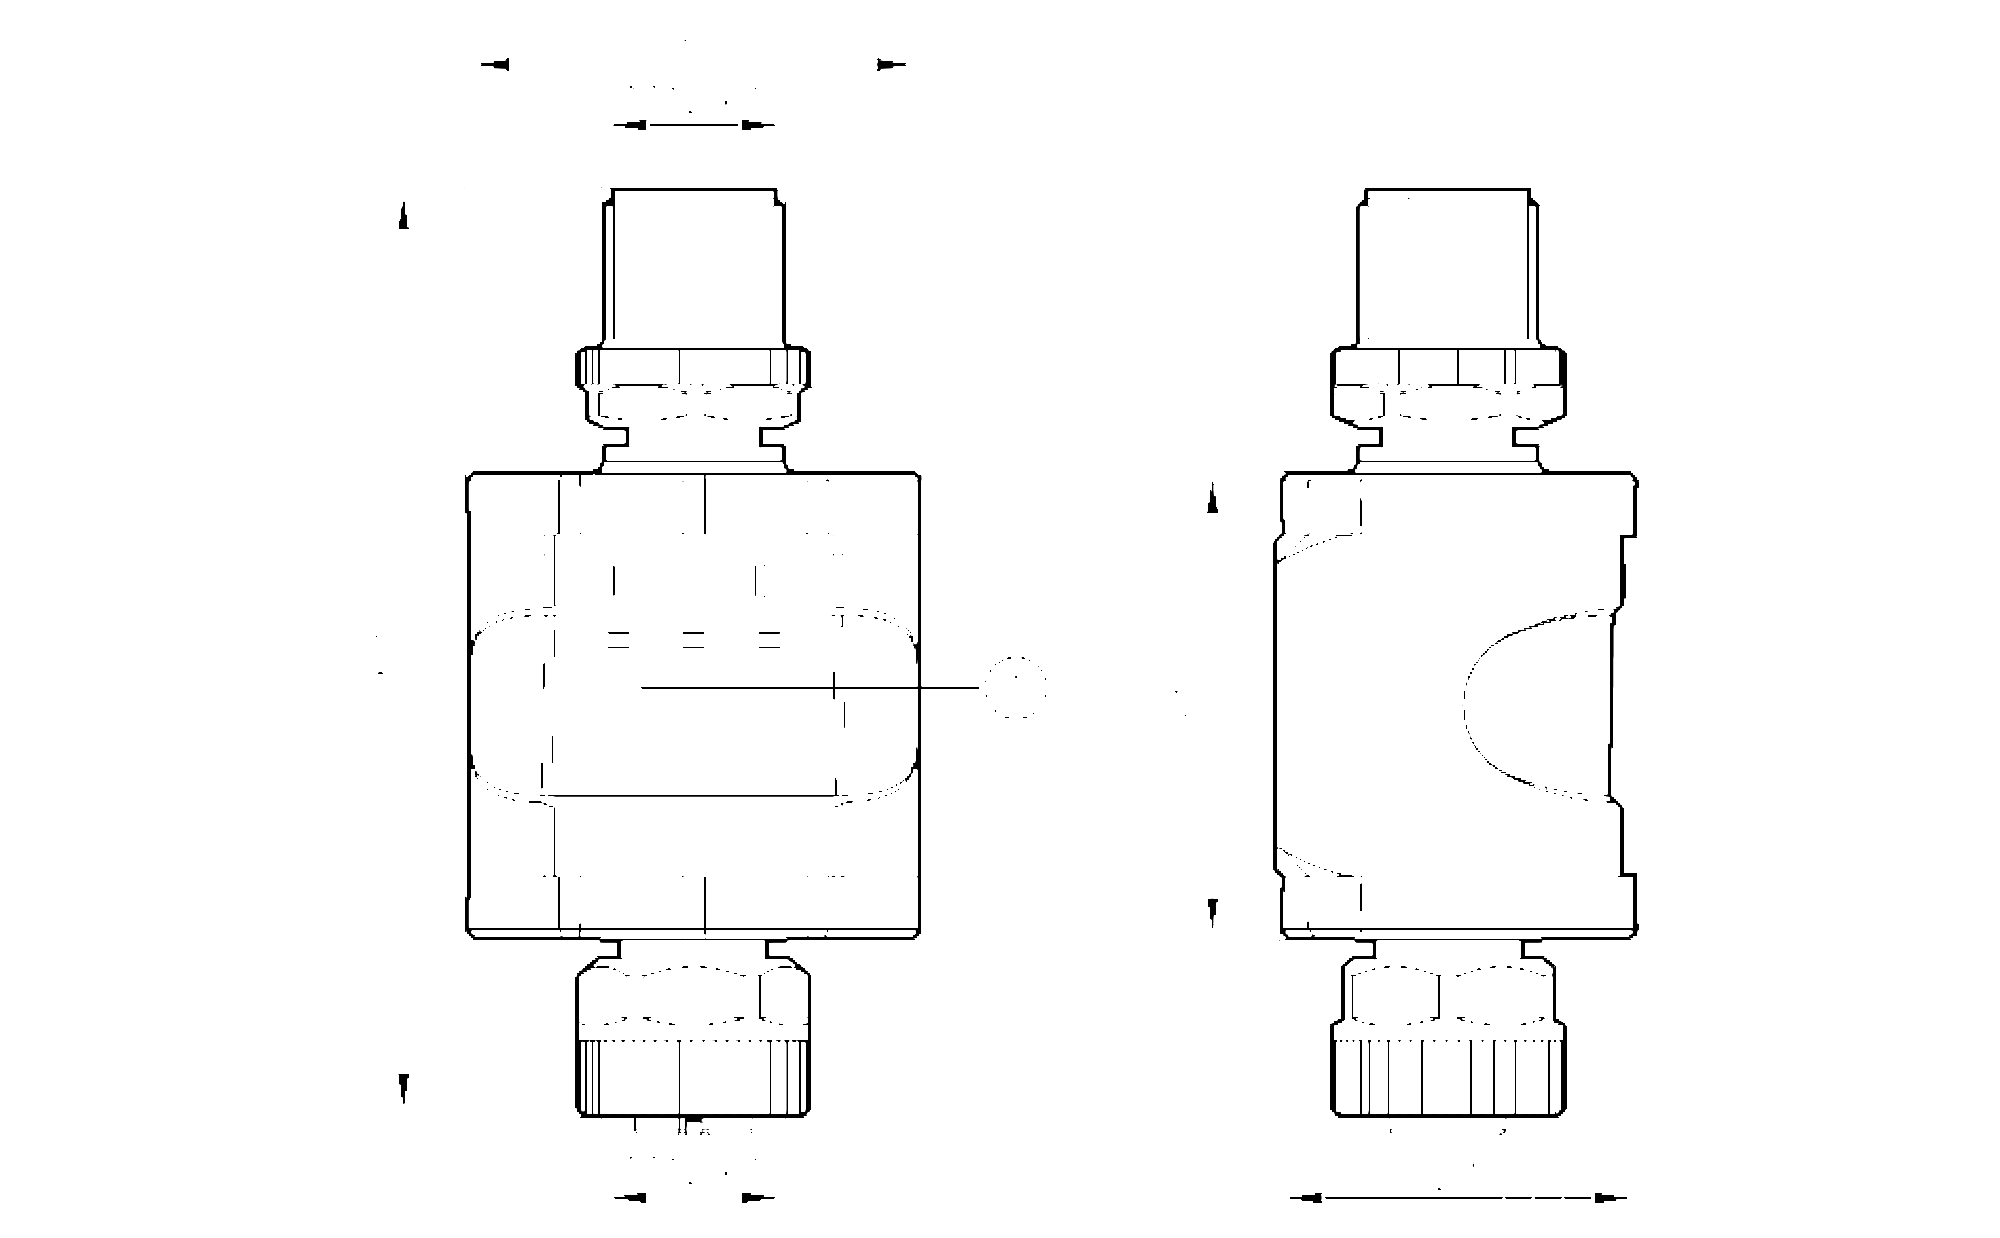 dp1213 - converter io-link - 4   20 ma